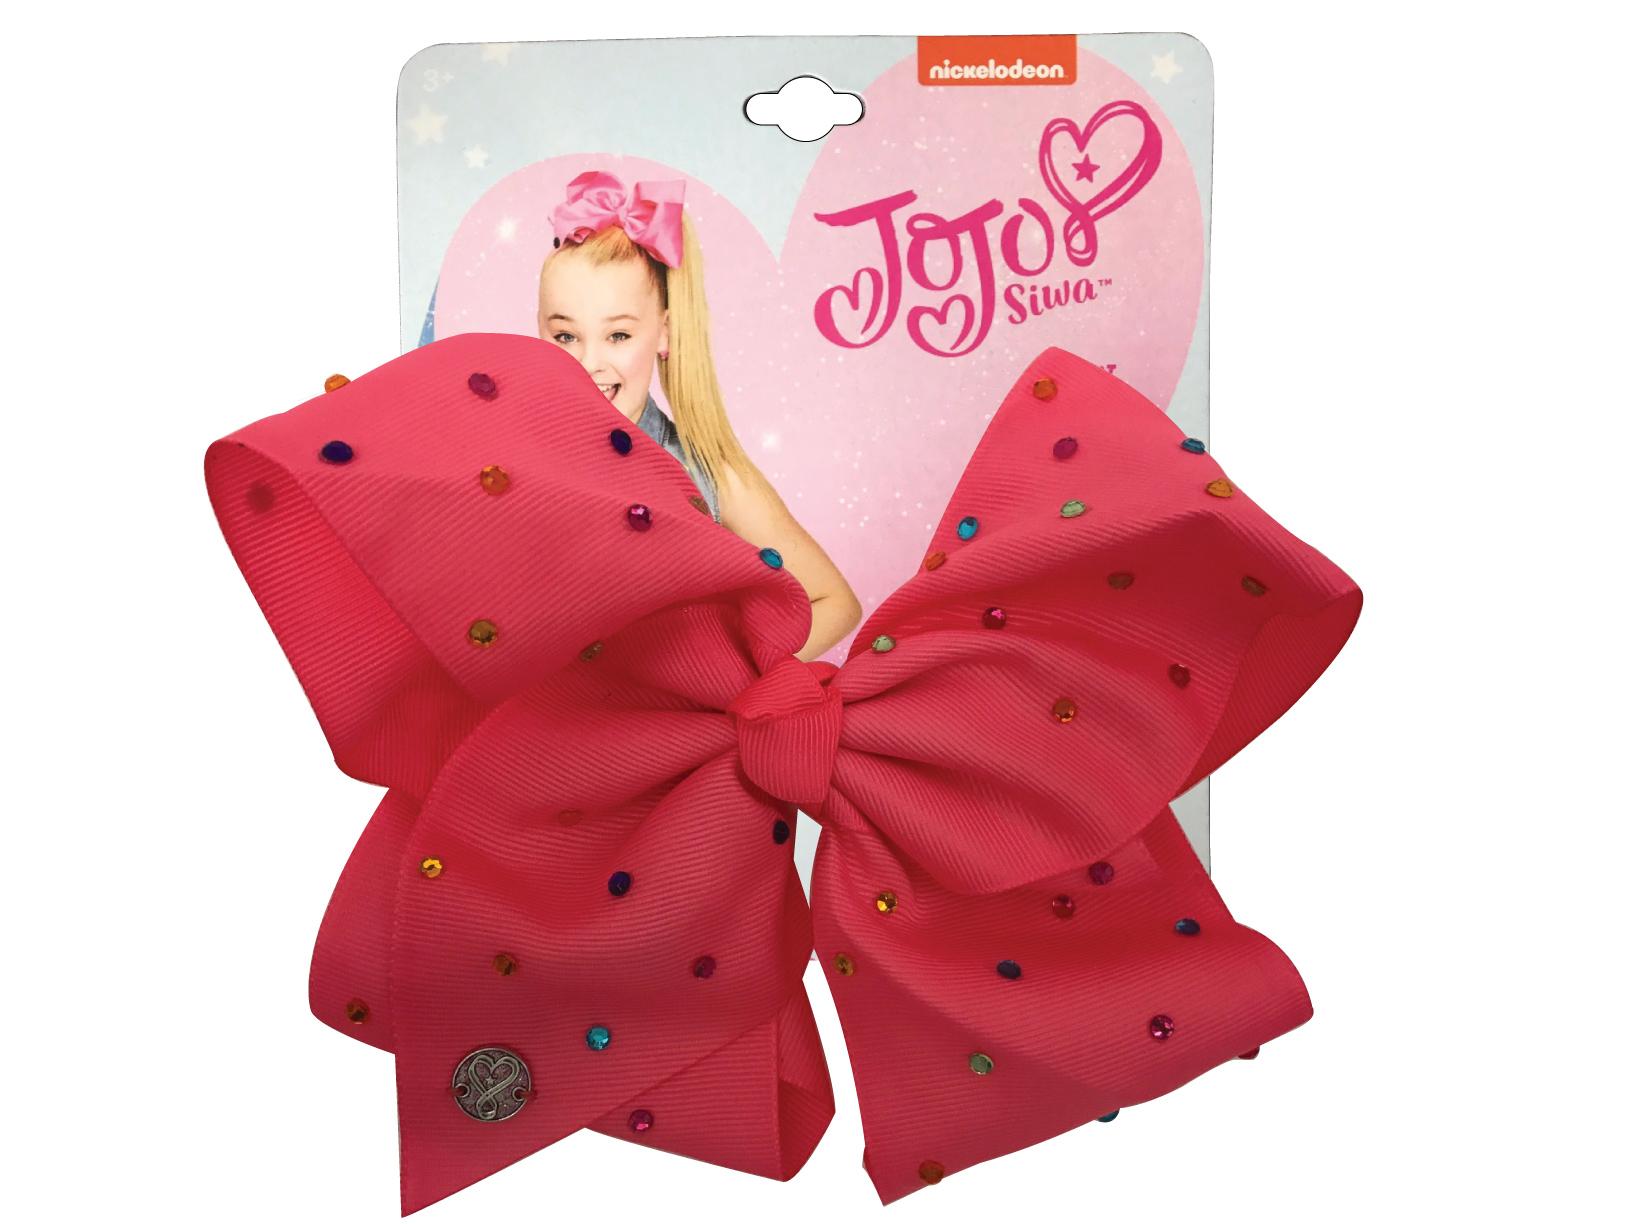 JoJo Siwa Large Cheer Hair Bow (Coral Pink w/Colored Rhinestones)